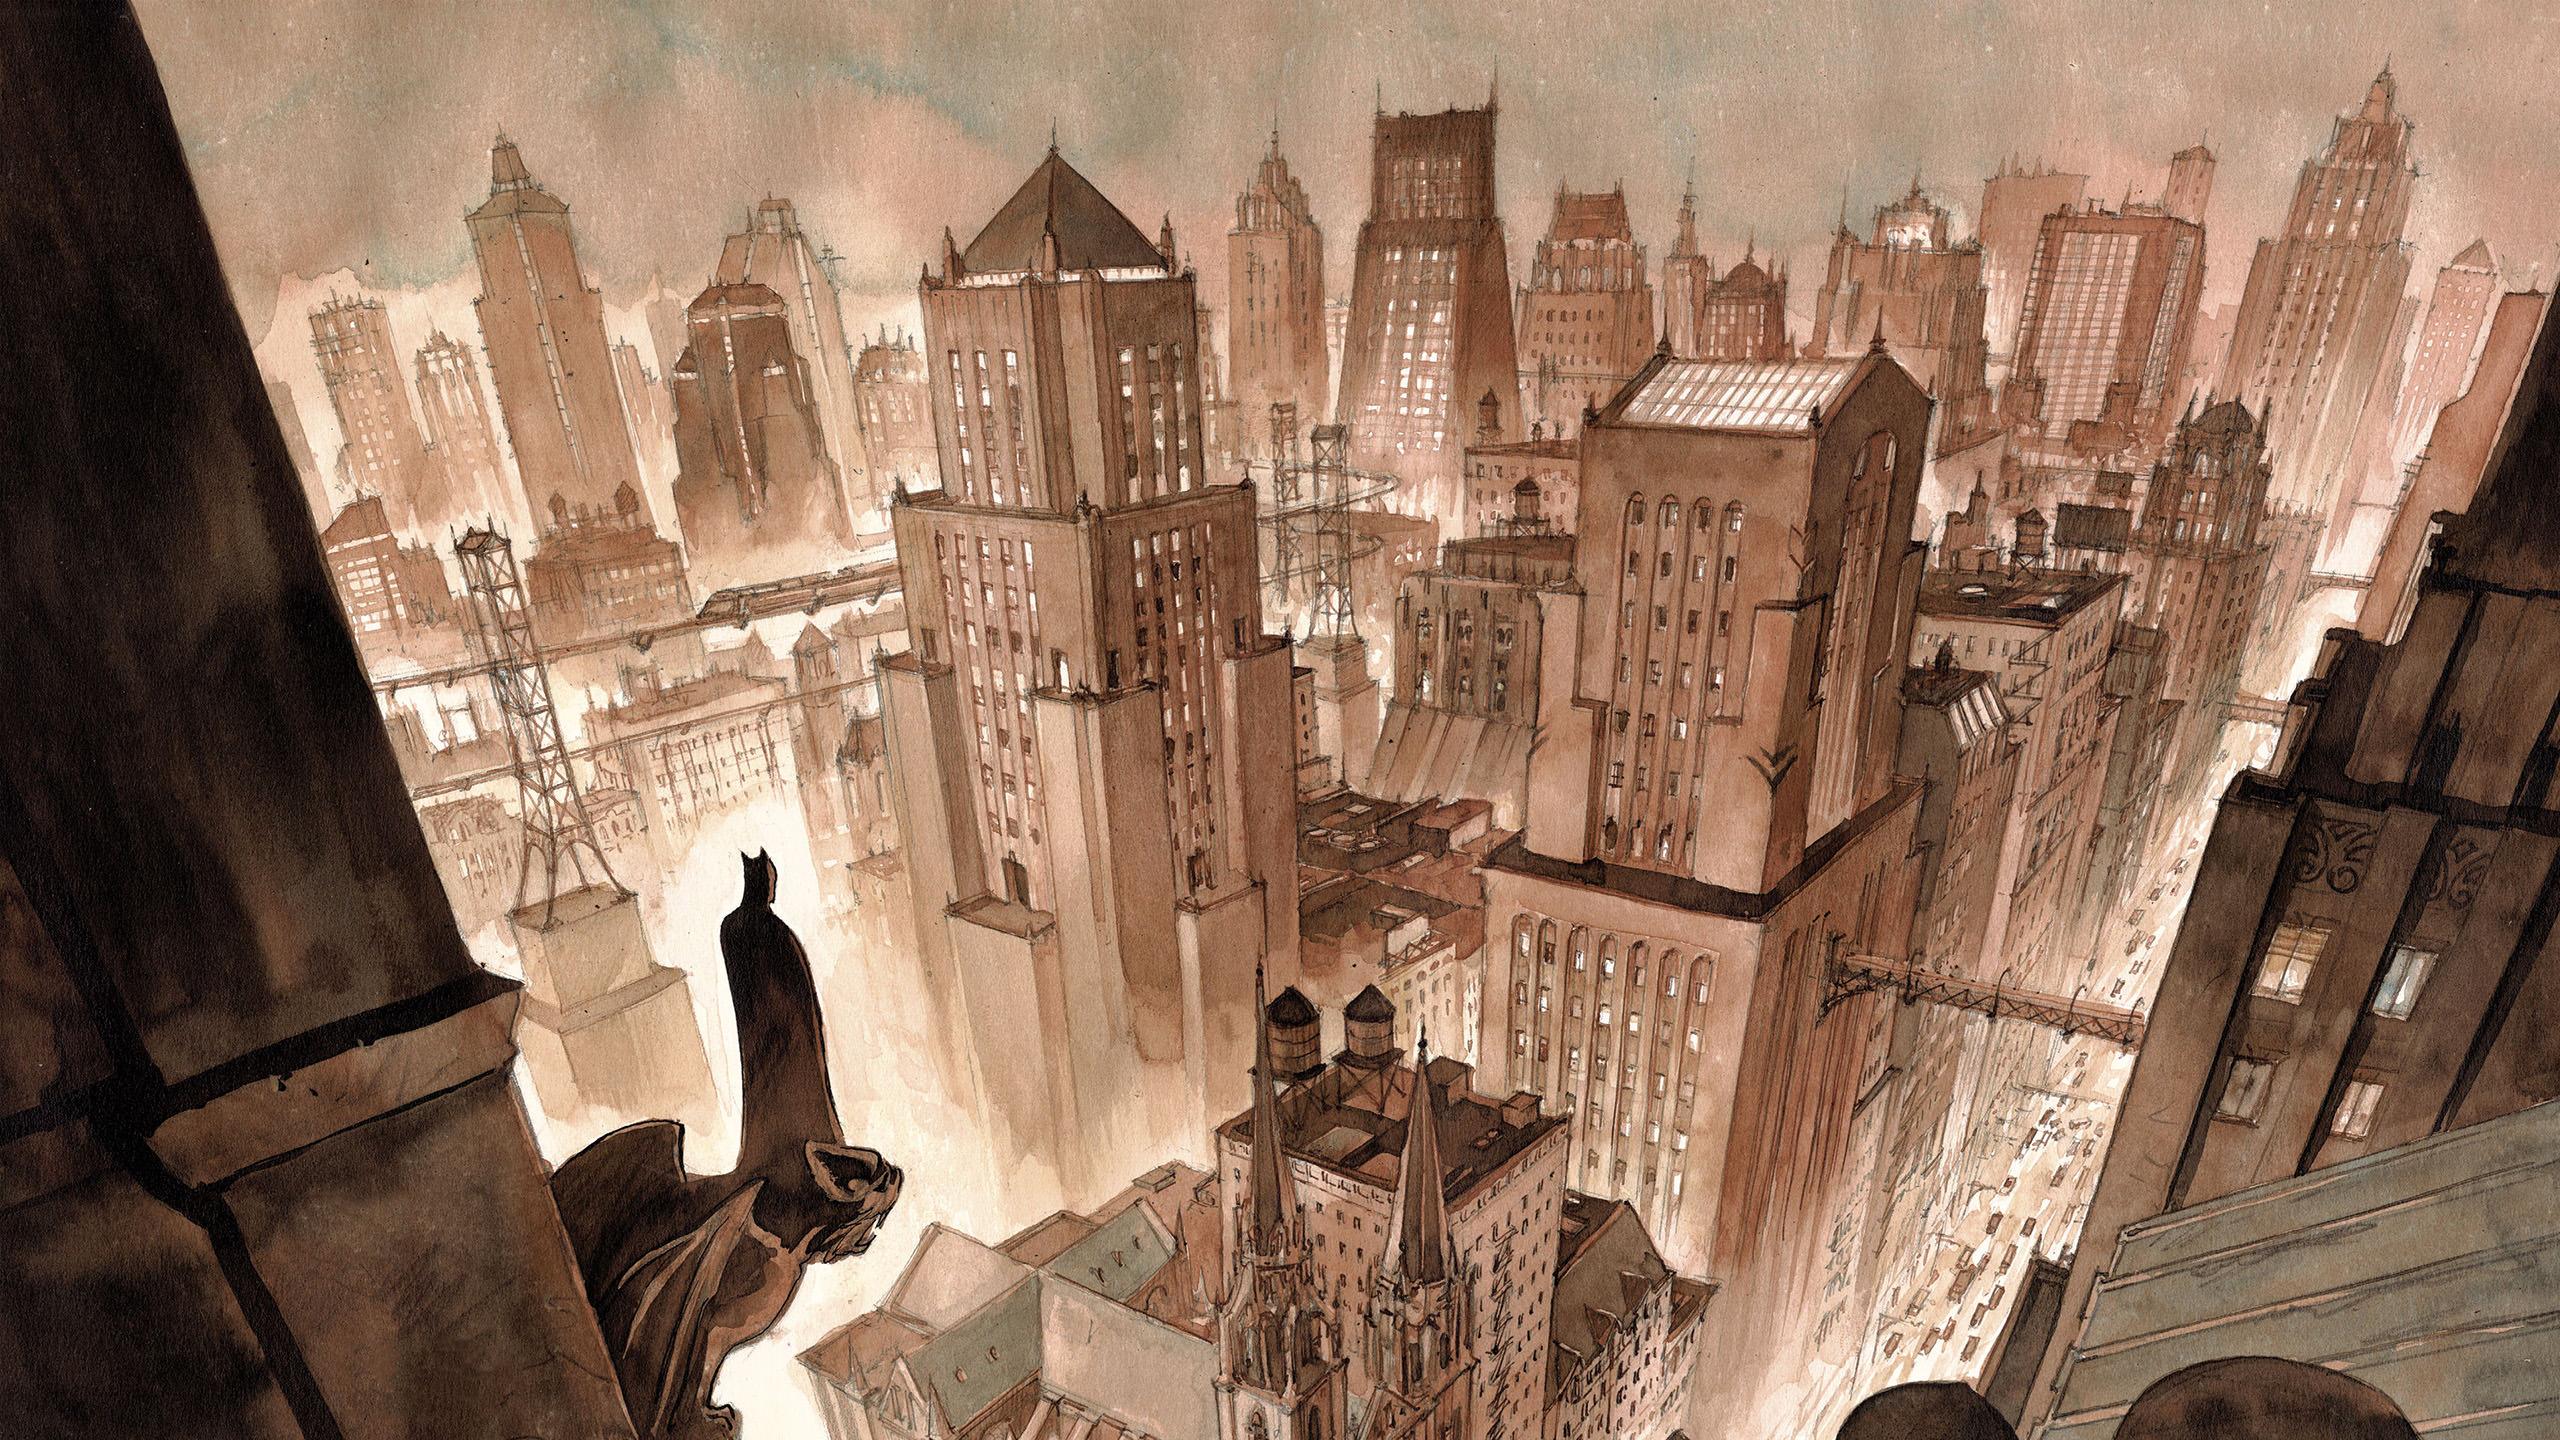 Artist Version Of Gotham City Fondo De Pantalla Hd Fondo